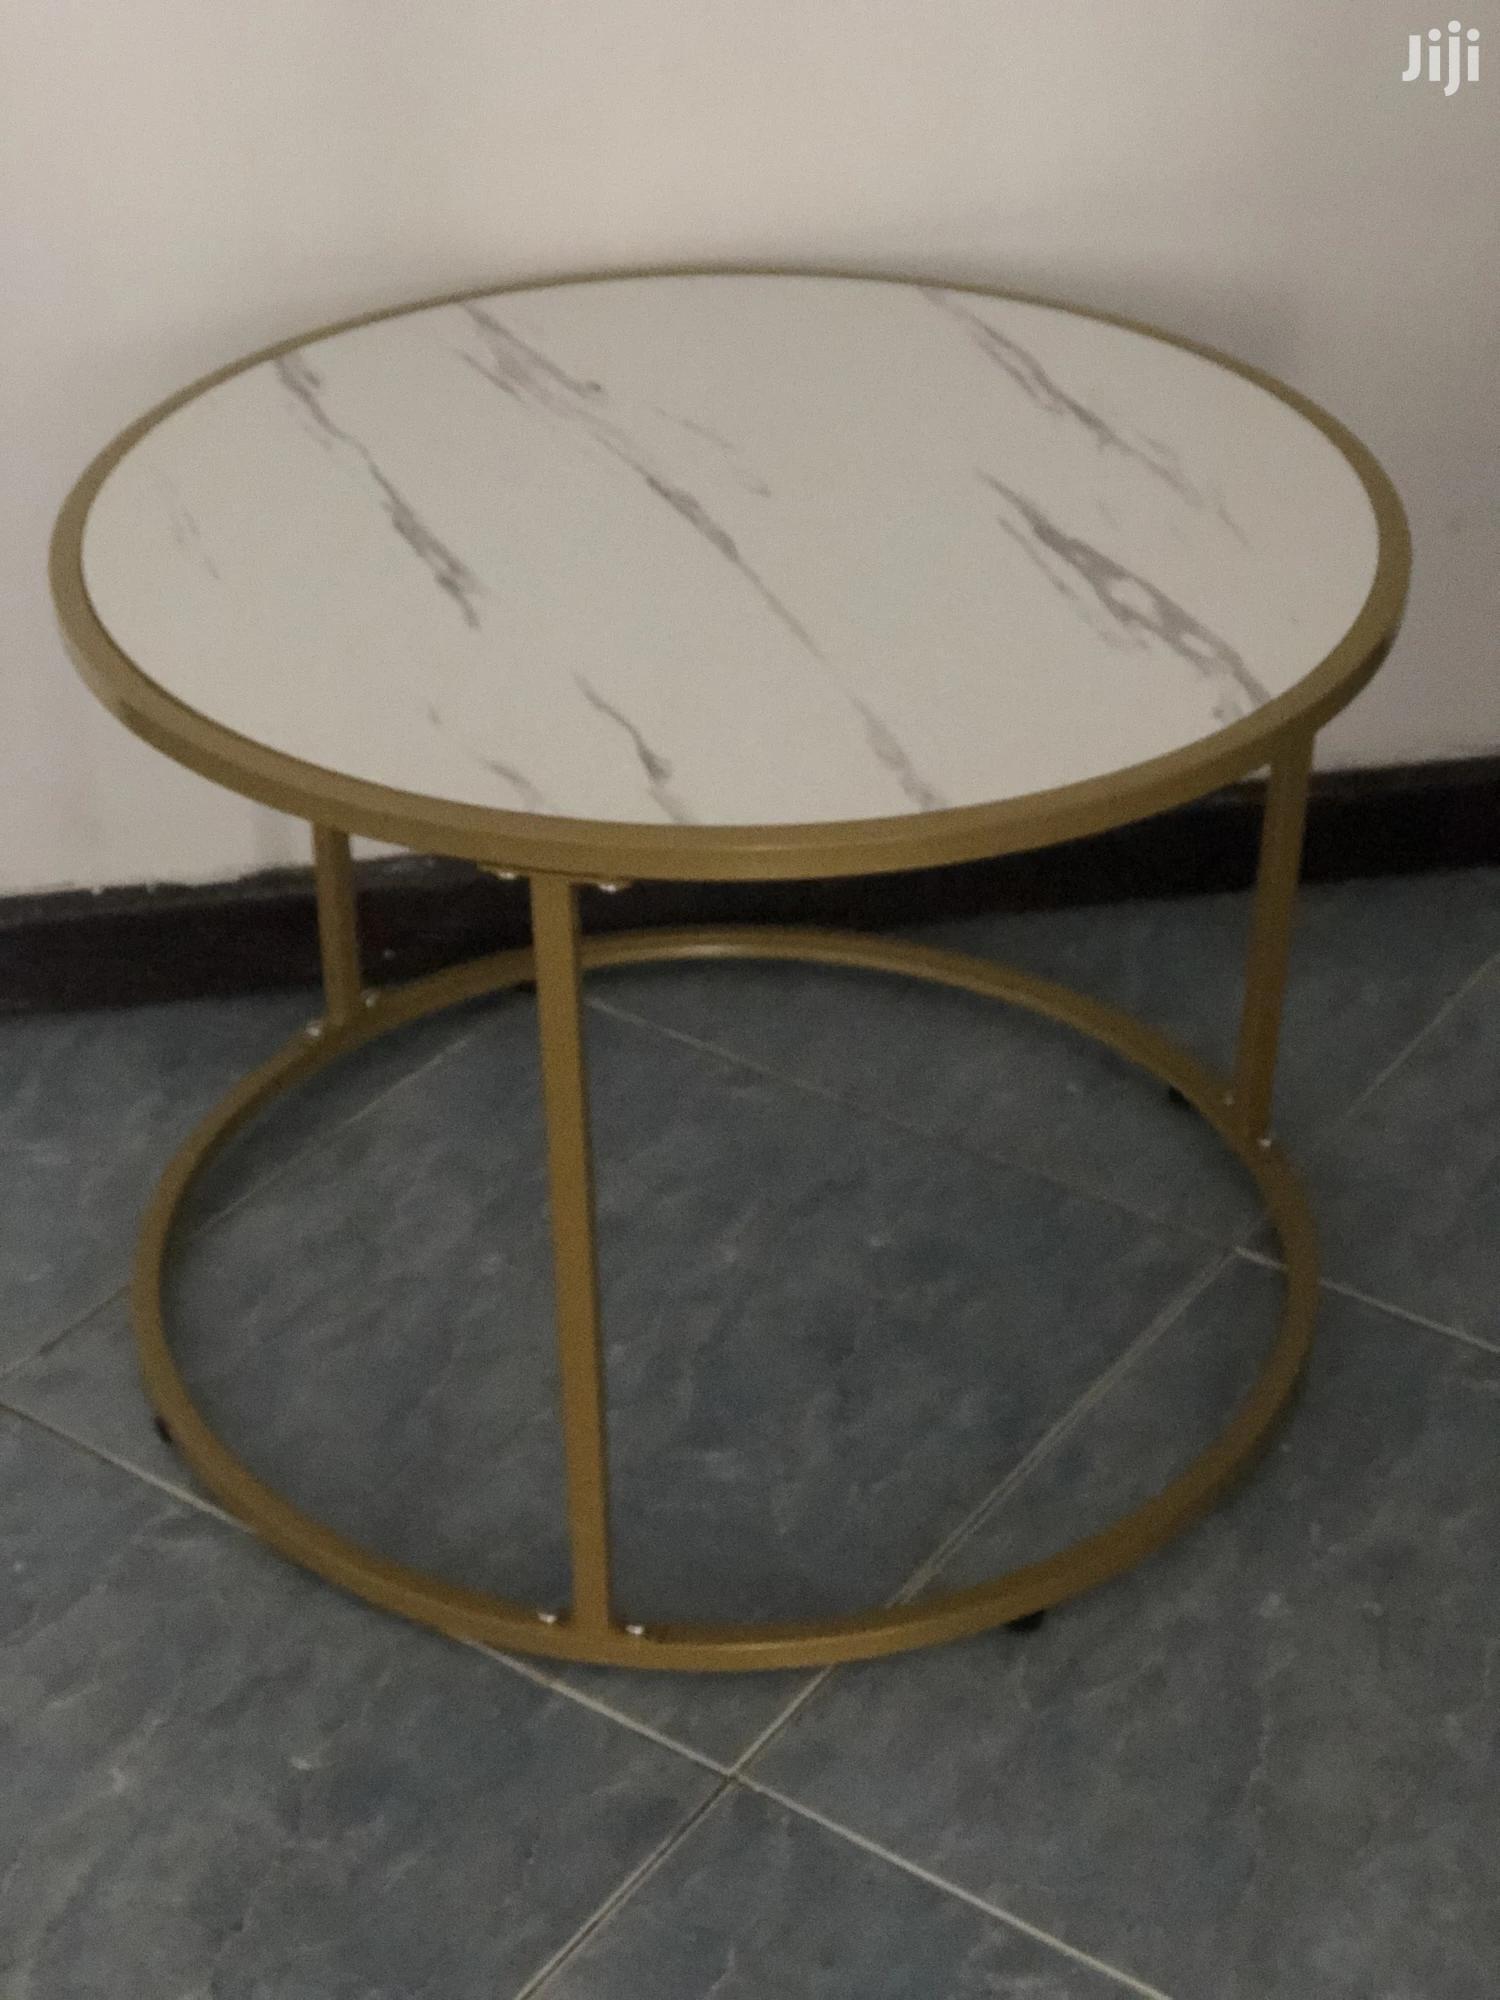 Coffee Table | Furniture for sale in Tema Metropolitan, Greater Accra, Ghana